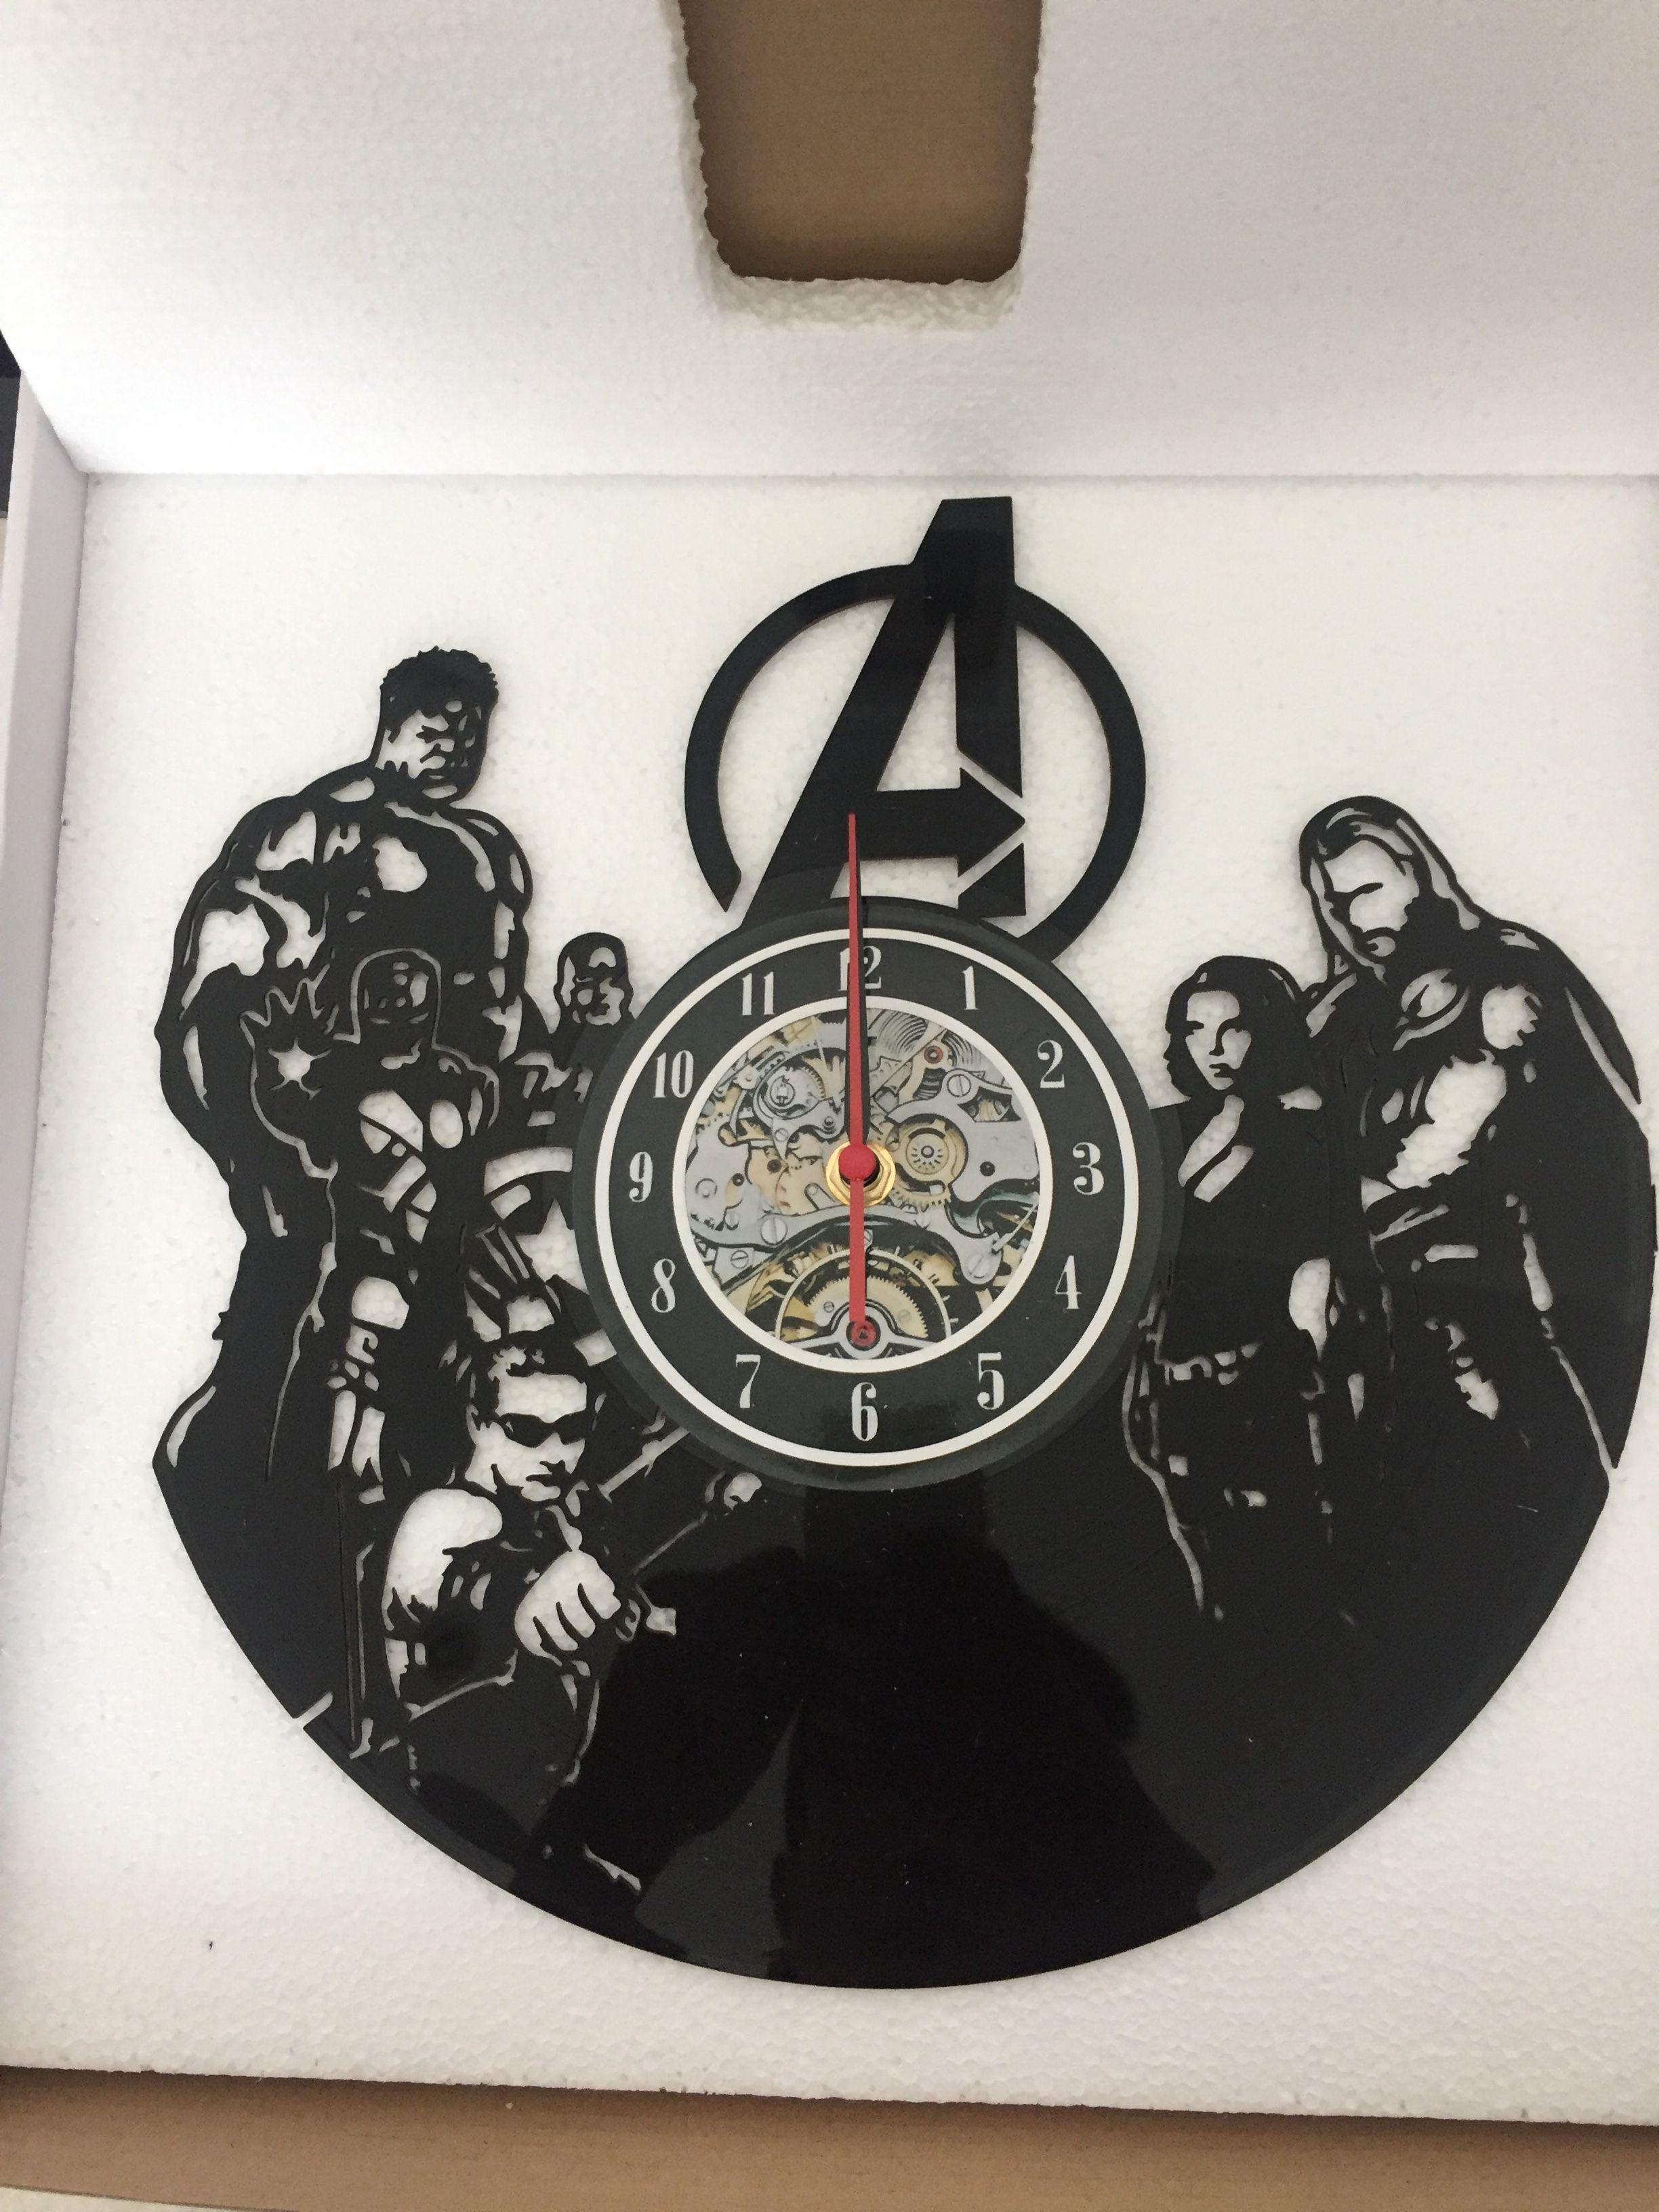 Avengers vinyl wall clock bedroom dcor christmas gift clocks for avengers vinyl wall clock bedroom dcor christmas gift clocks for home clocks for kitchen from dg88090431 2614 dhgate amipublicfo Images